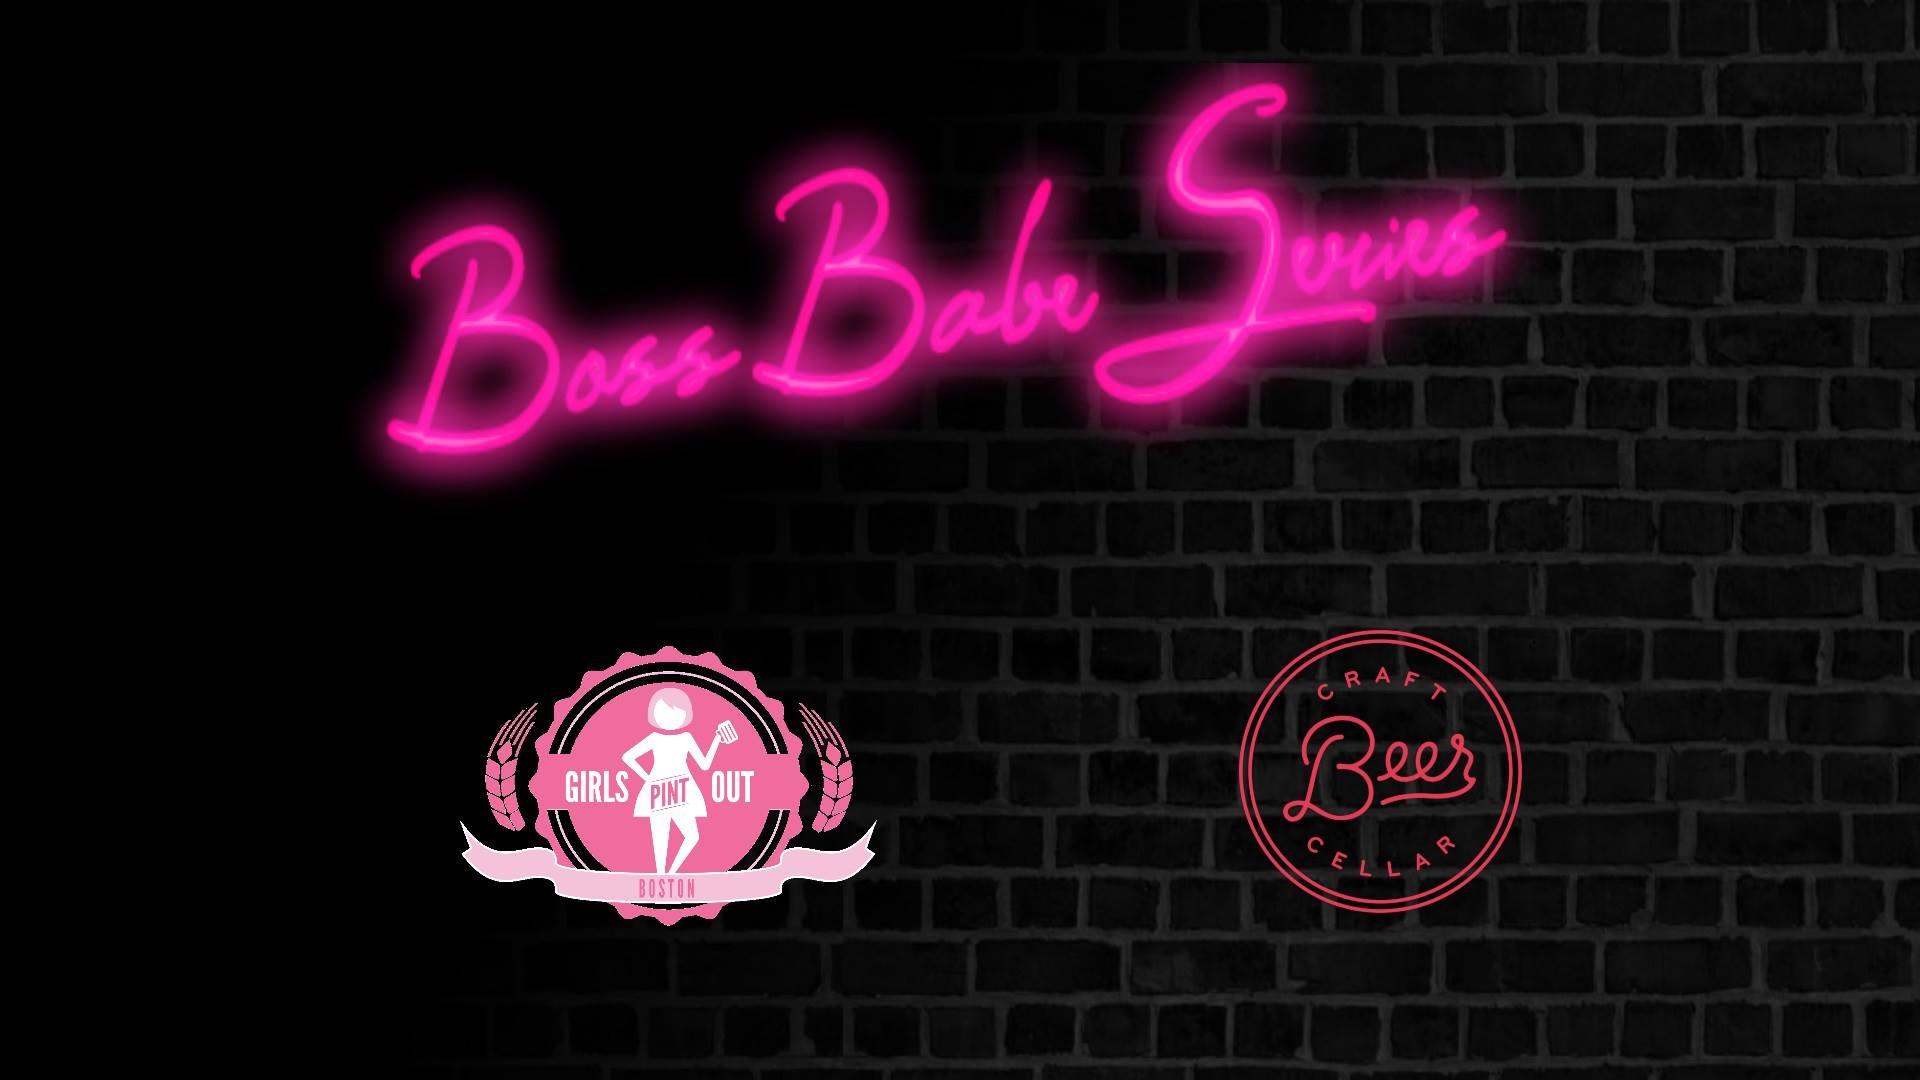 Boss Babes Series Suzanne Schalow Of Craft Beer Cellar